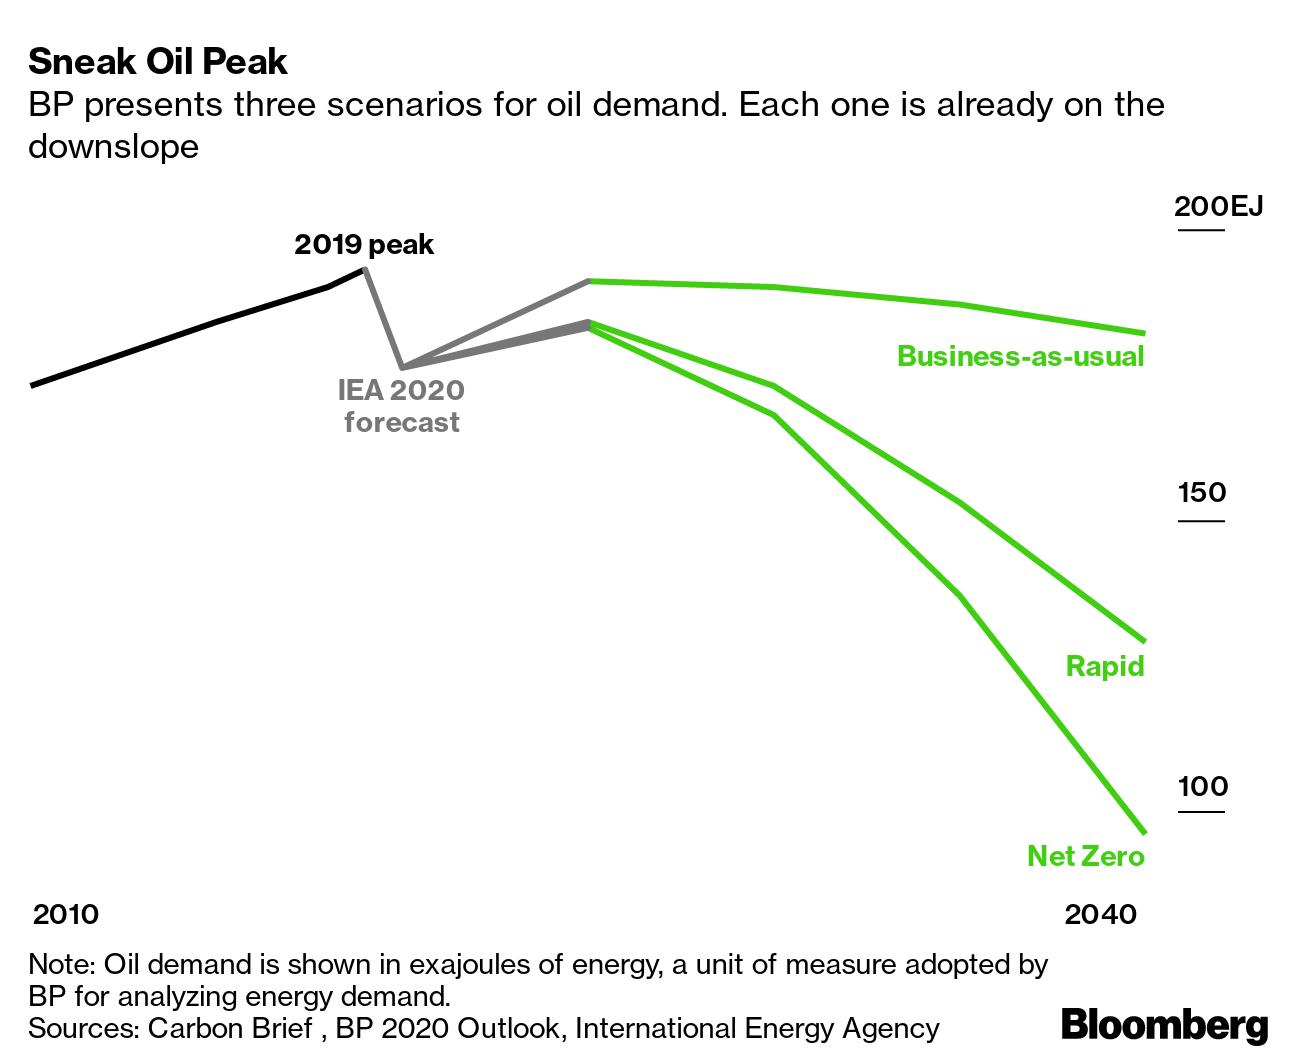 Sneak Oil Peak